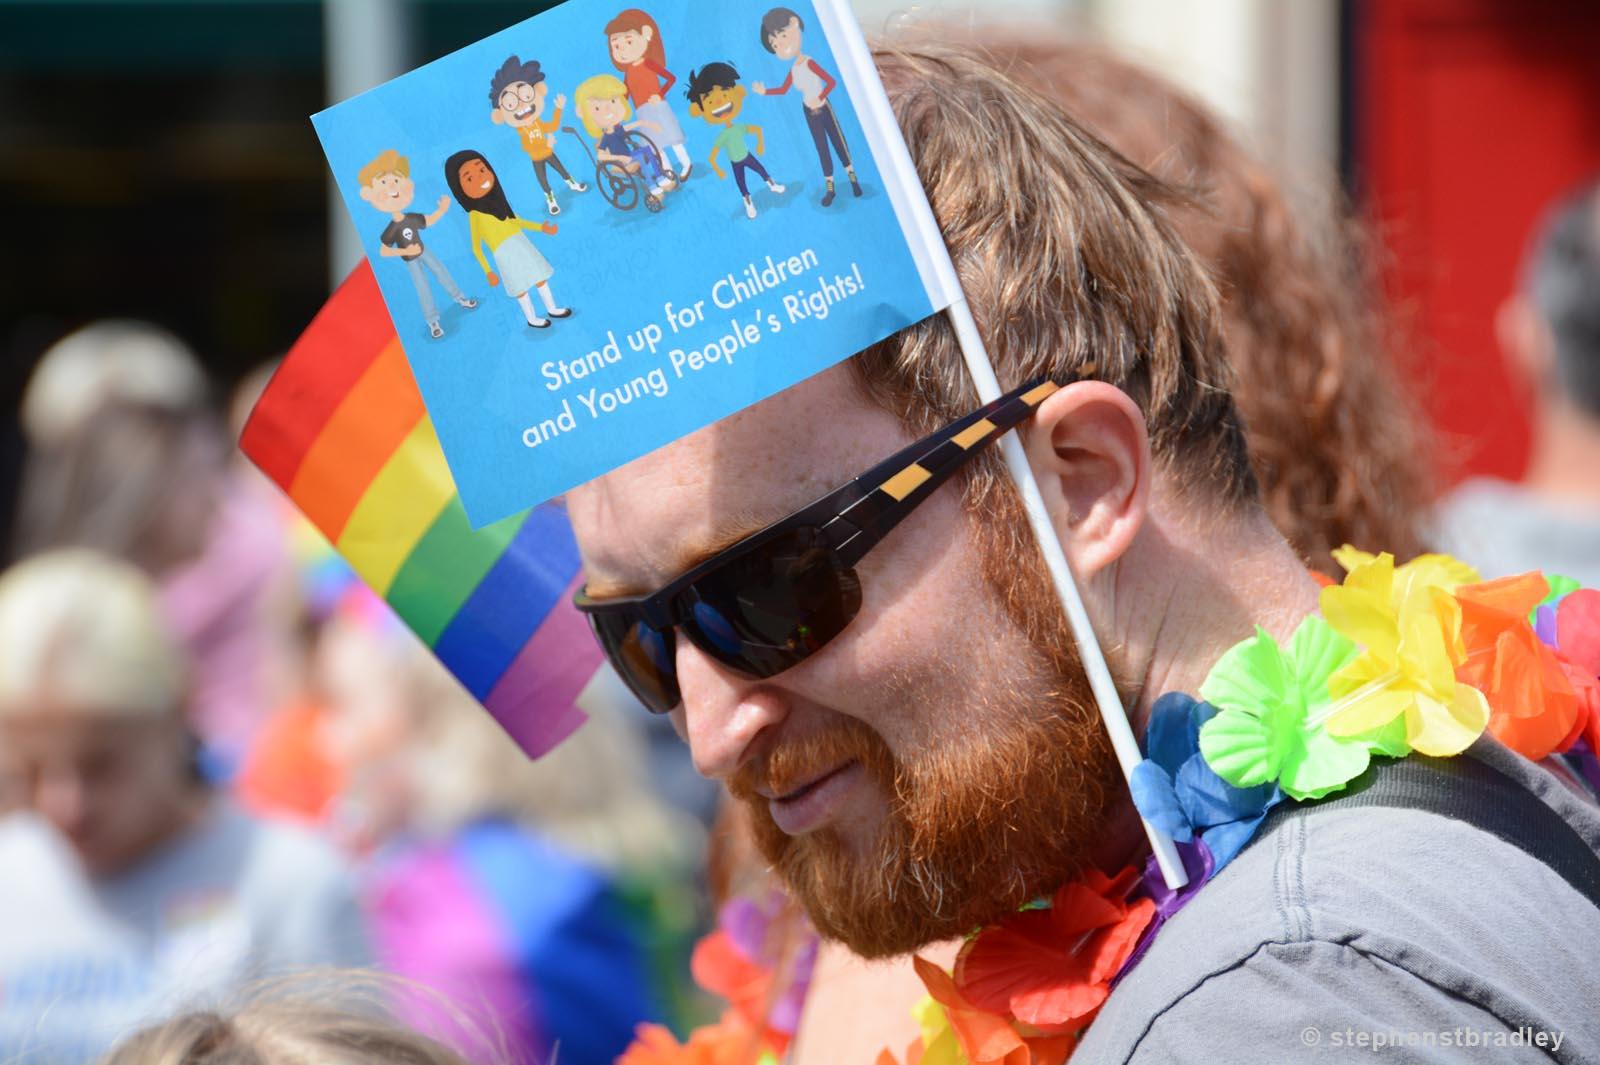 Editorial photographer Dublin portfolio photo 8593 of Belfast Pride Parade by Stephen S T Bradley